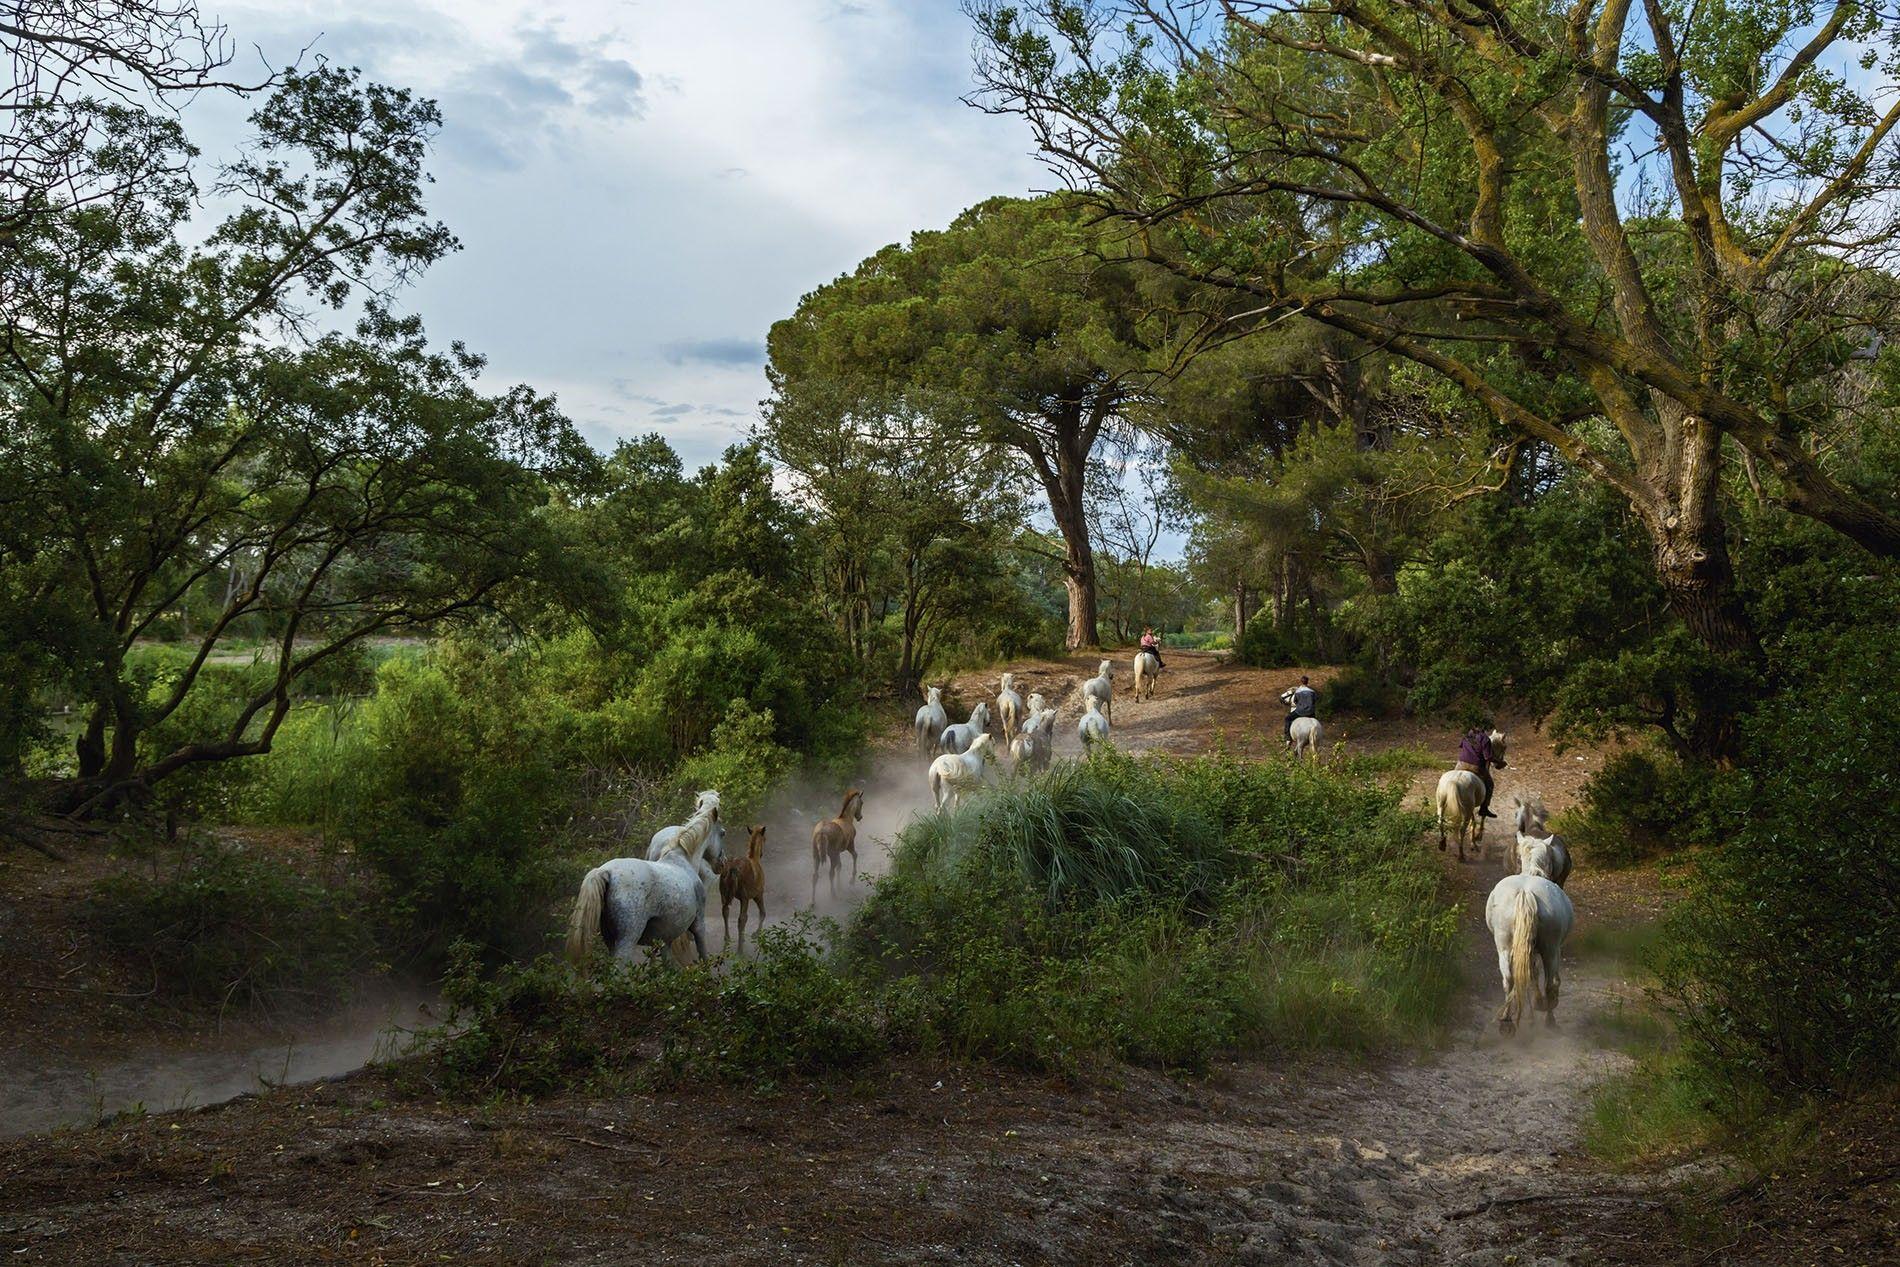 Wild horses of the Camargue near Aigues-Mortes.